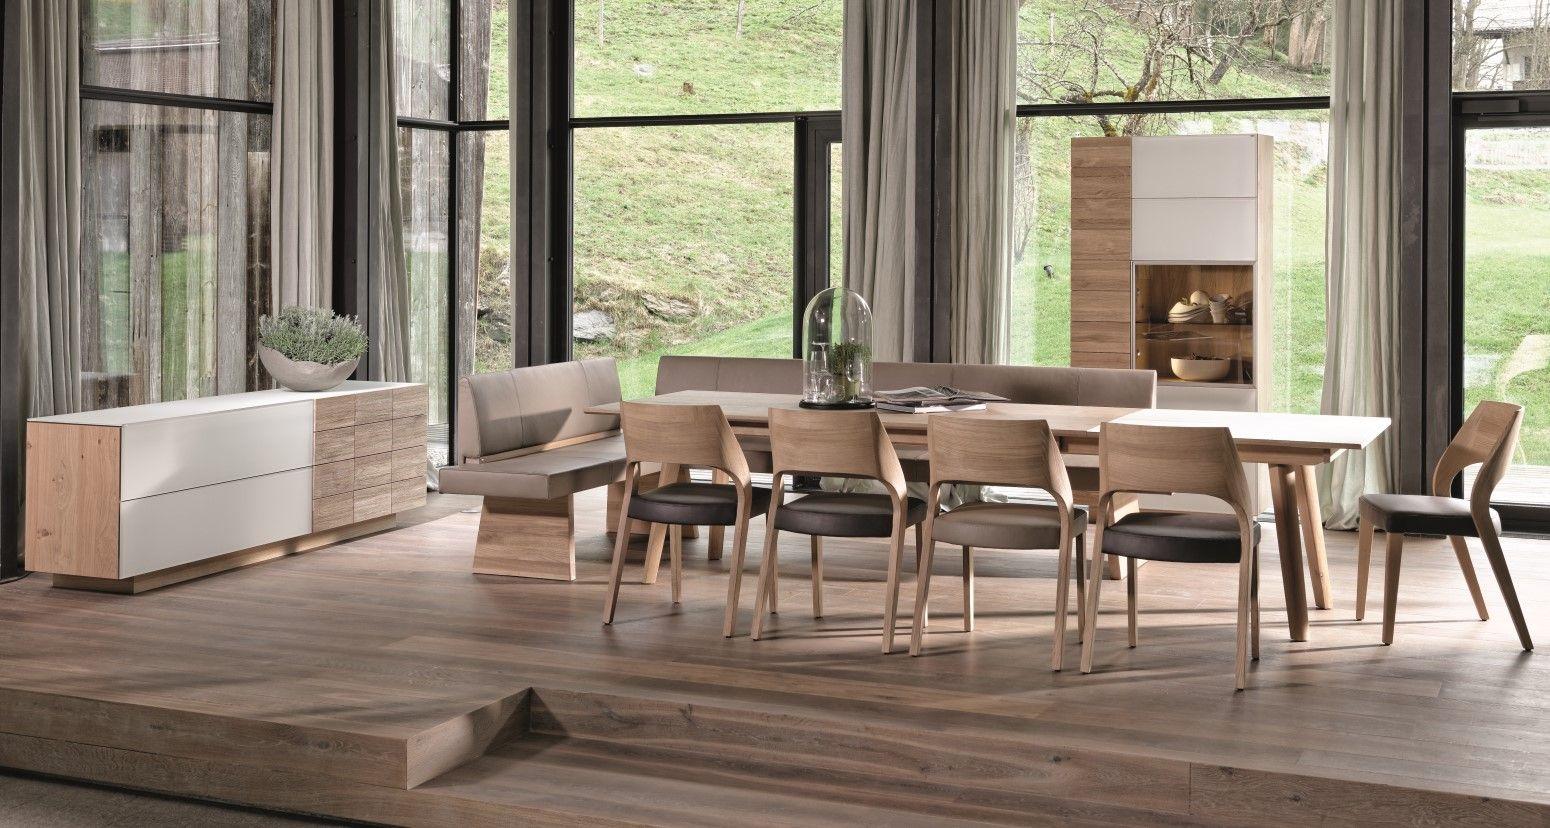 Voglauer V Montana Tisch Stuhl Kuchen Rustikal Innenarchitektur Landhauskuche